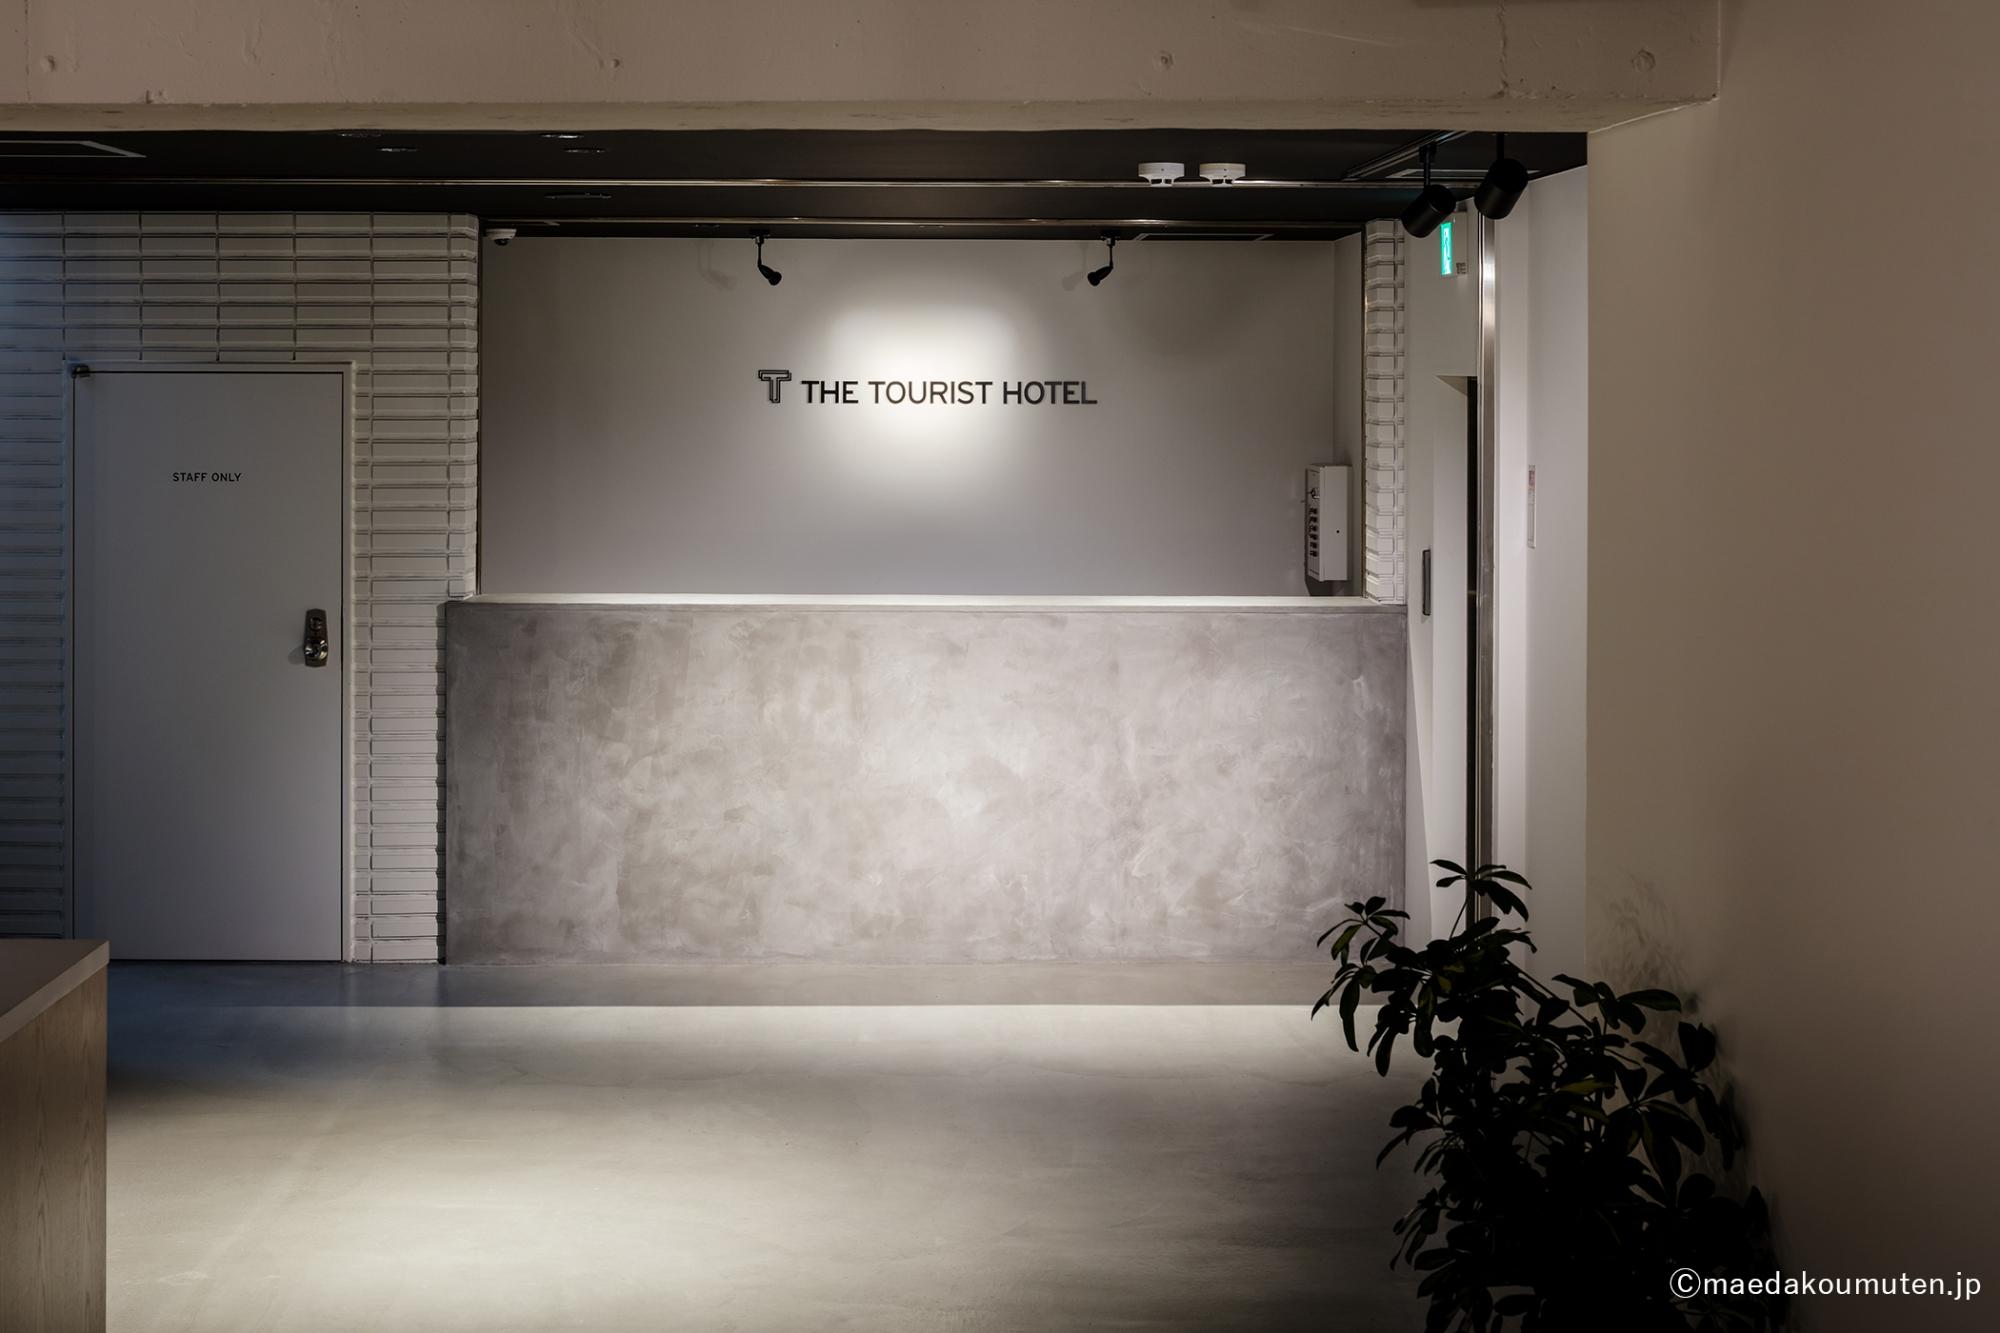 神奈川、工務店、注文住宅、デザイン住宅、建築家、THE TOURIST HOTEL、10